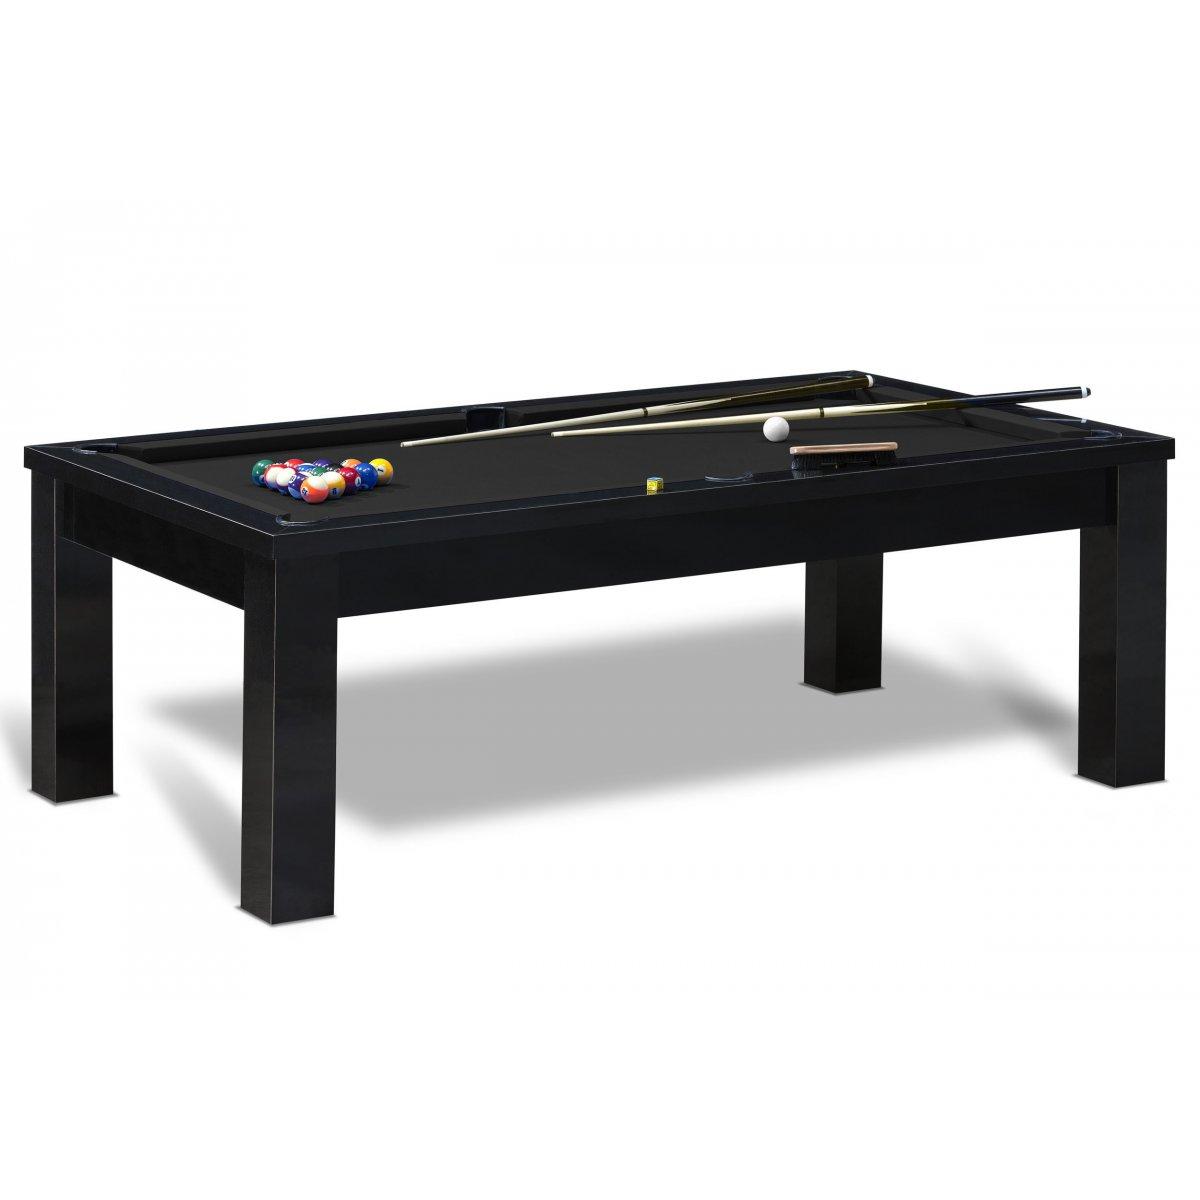 billard am ricain avec accessoires billard us table noire. Black Bedroom Furniture Sets. Home Design Ideas